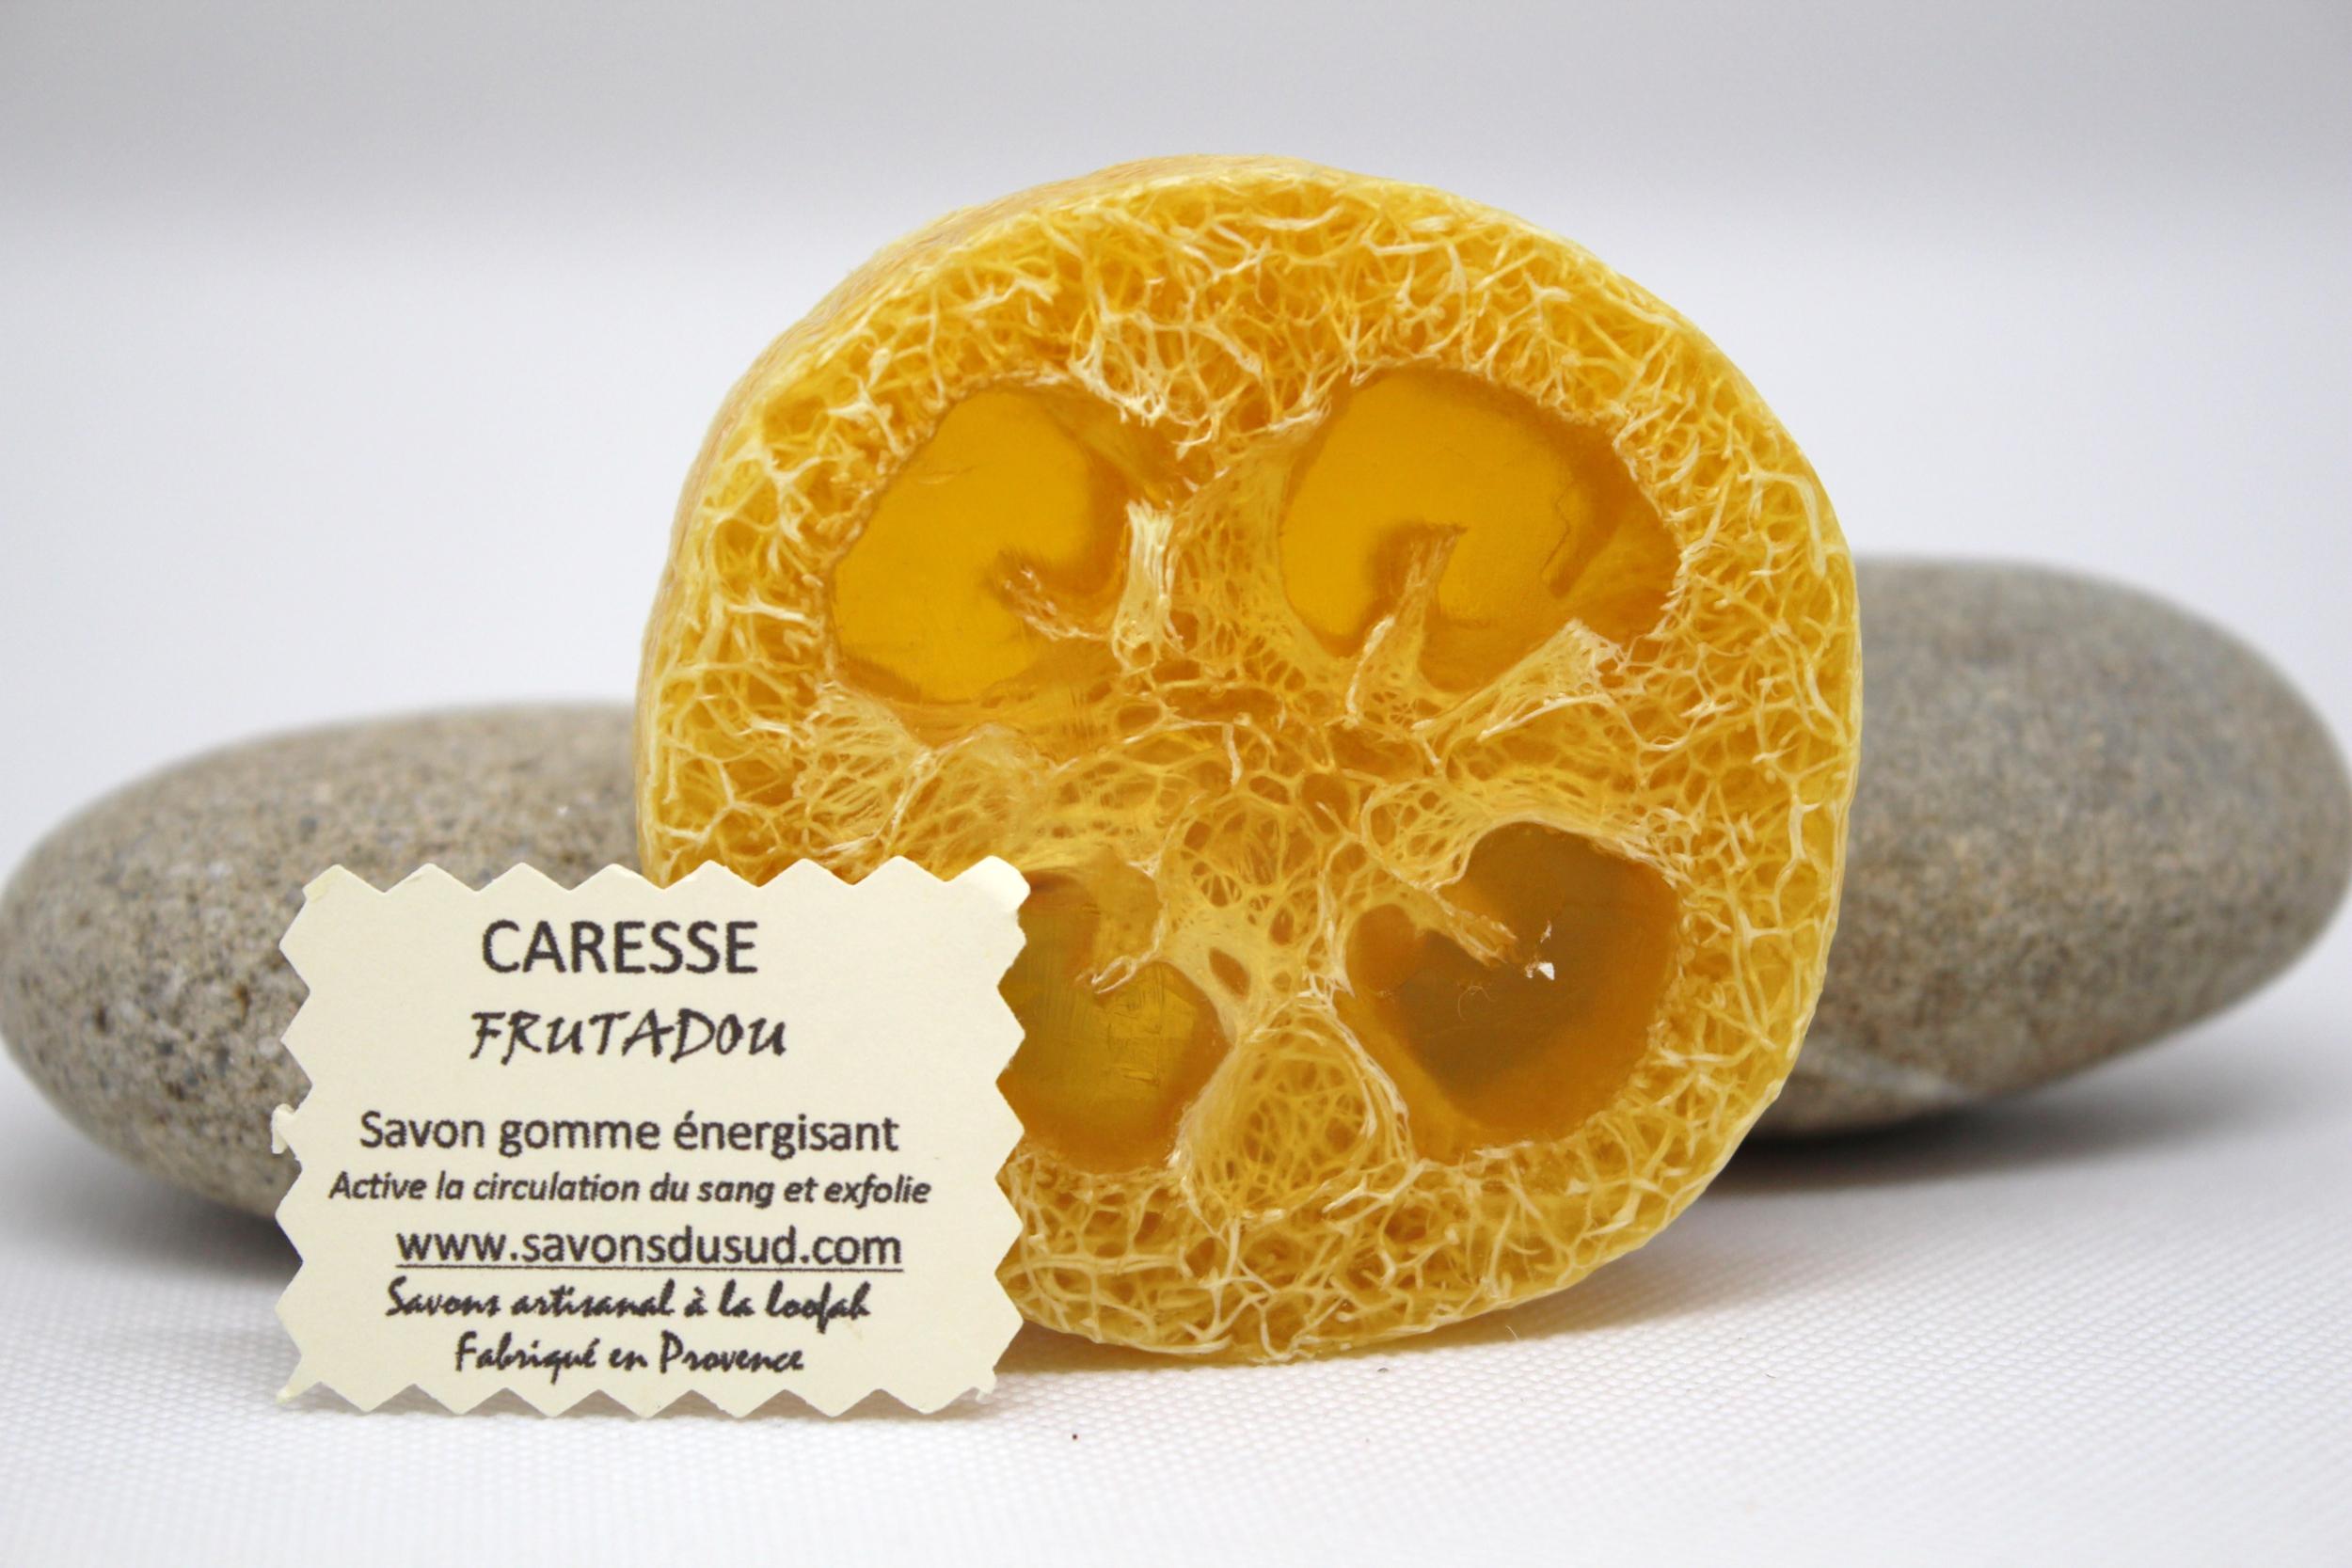 Frutadou Caresse